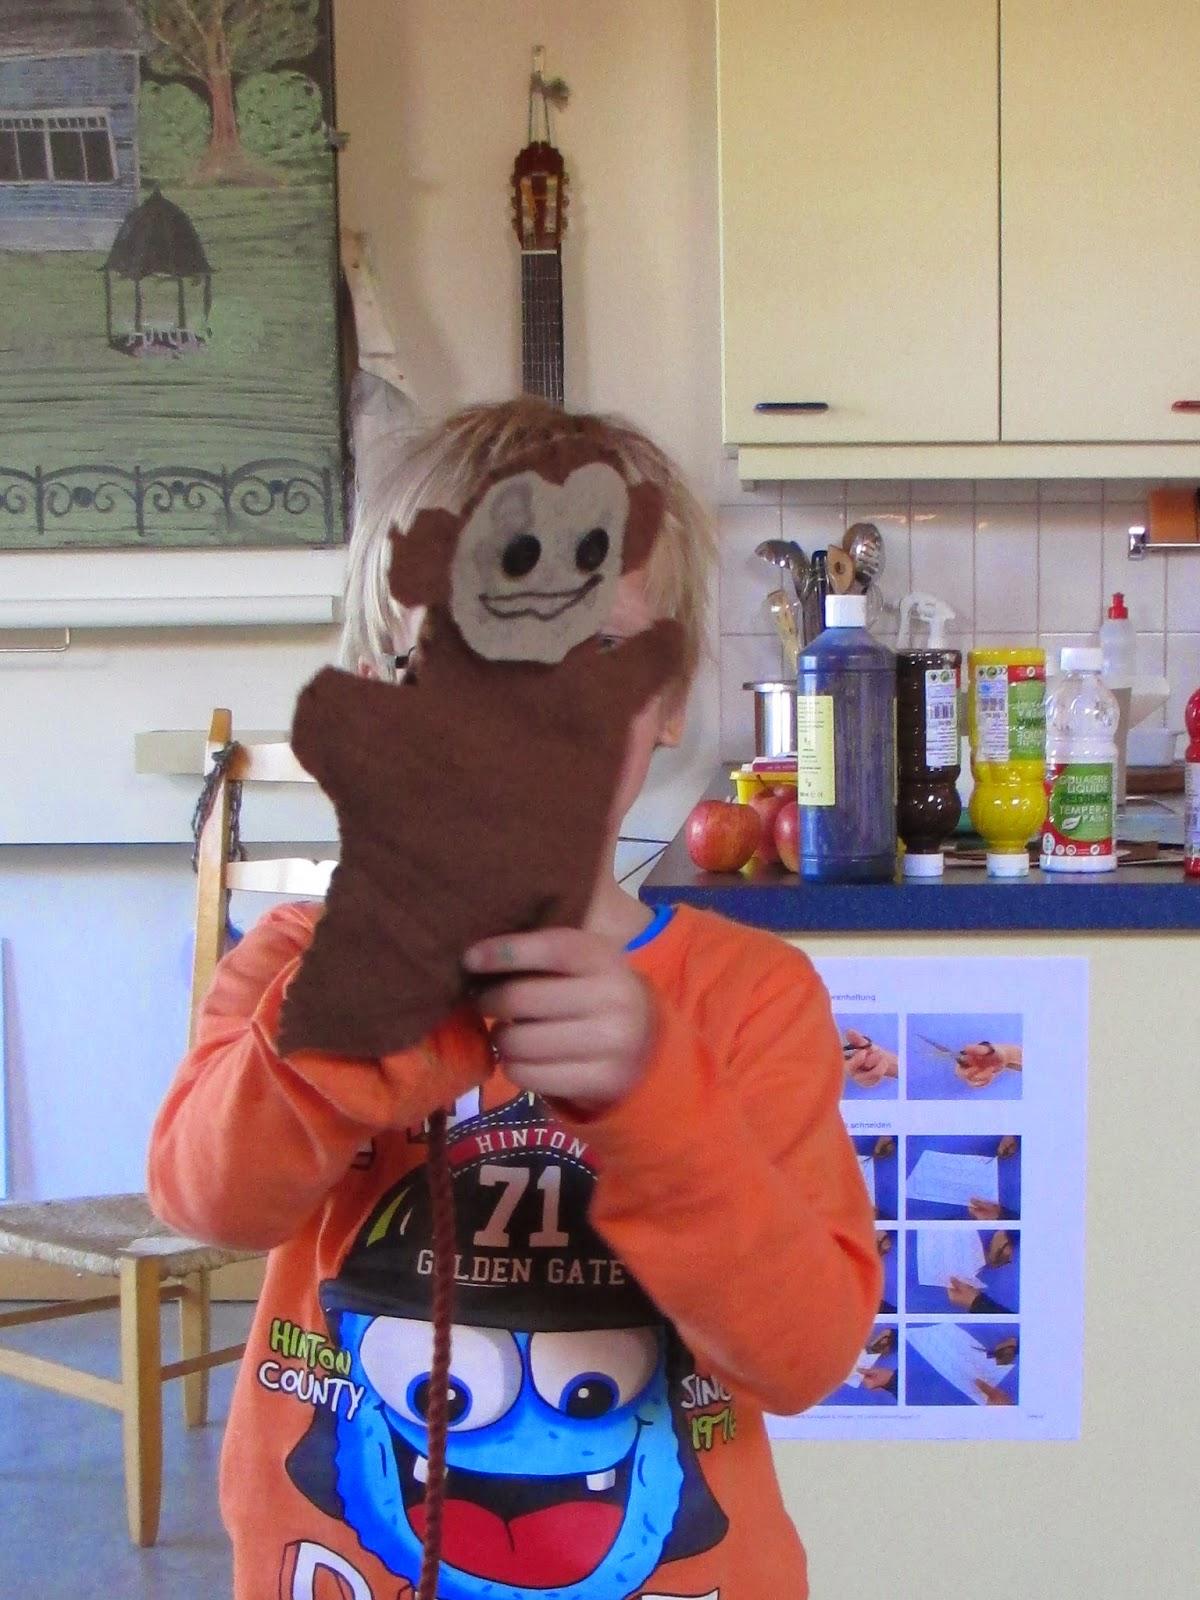 Märlimuus: Handpuppe Affe mit Kindern nähen - Schnittmuster als Download